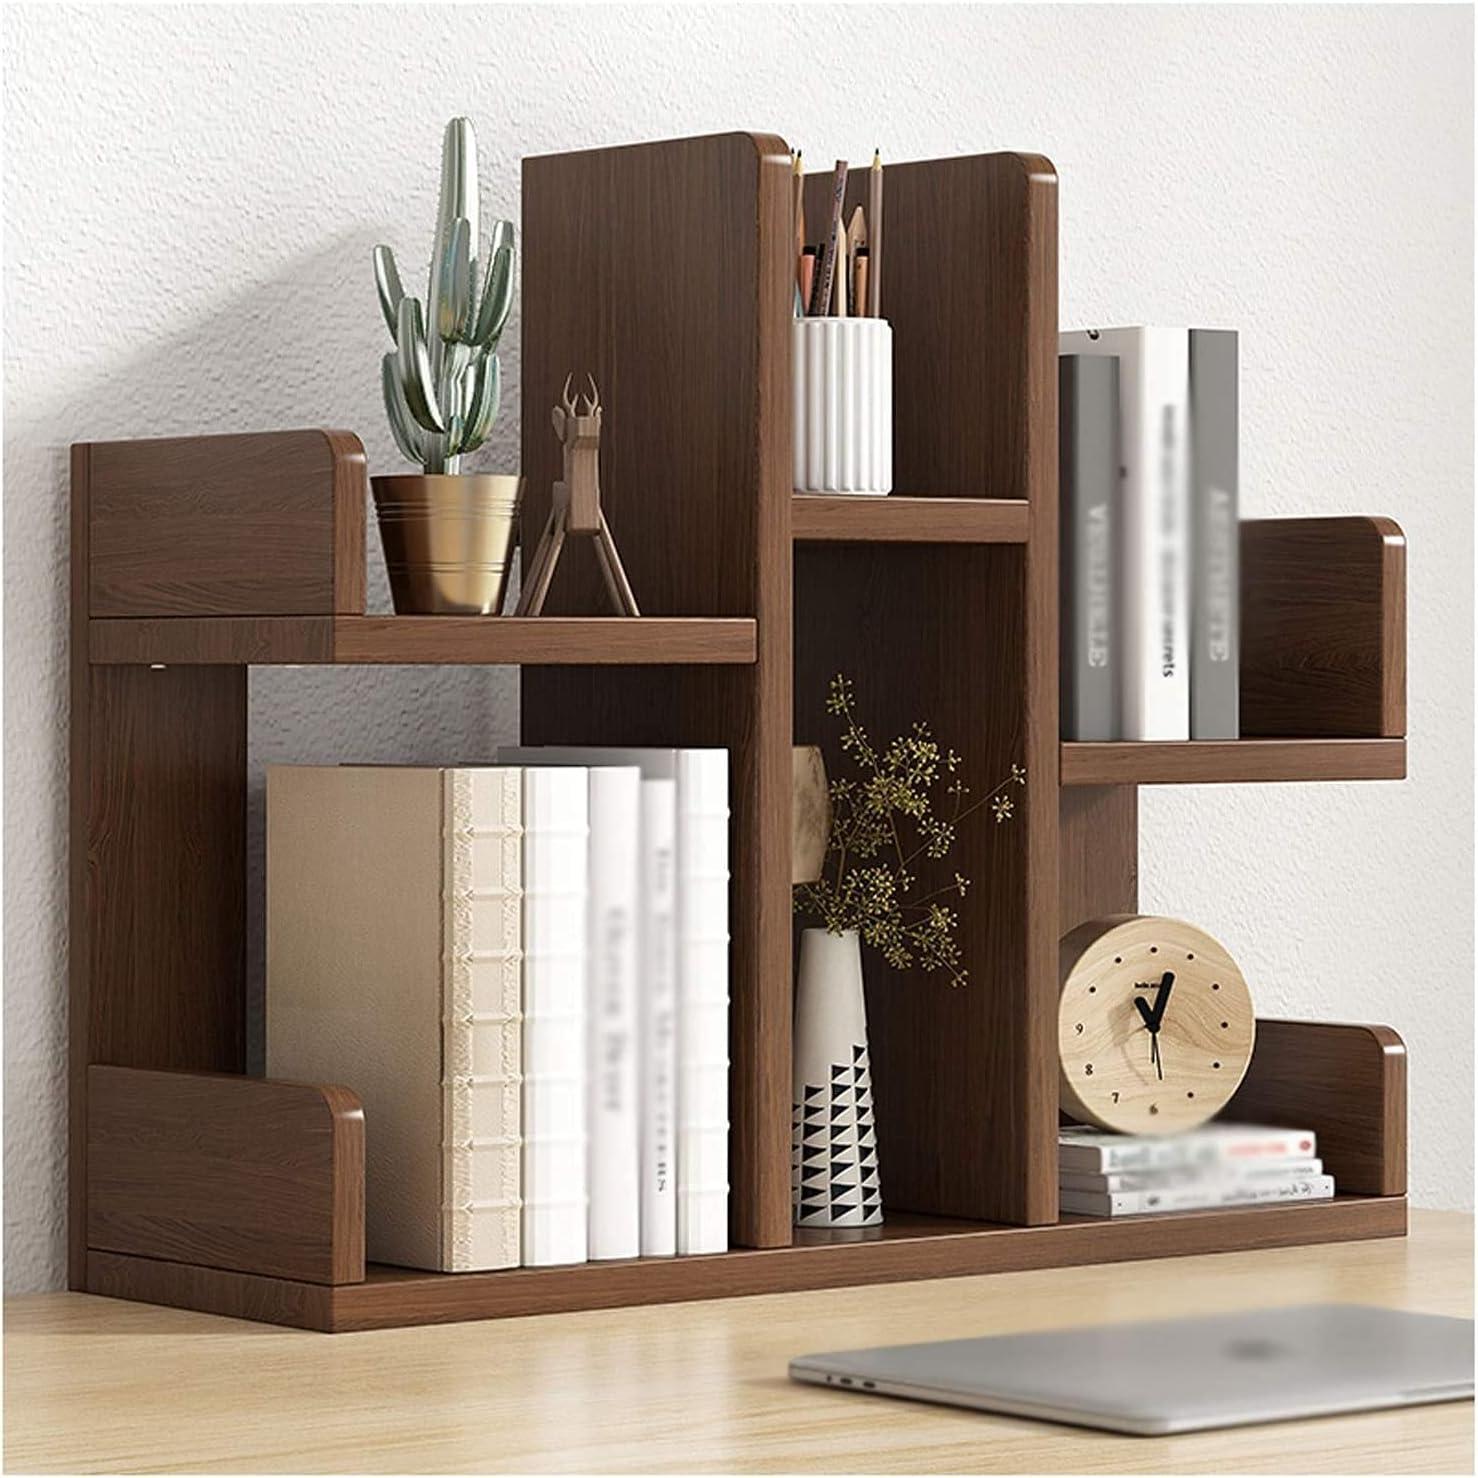 Store LBMTFFFFFF Novelty Bookshelf Storage Desktop Simple Bookshe 25% OFF Rack